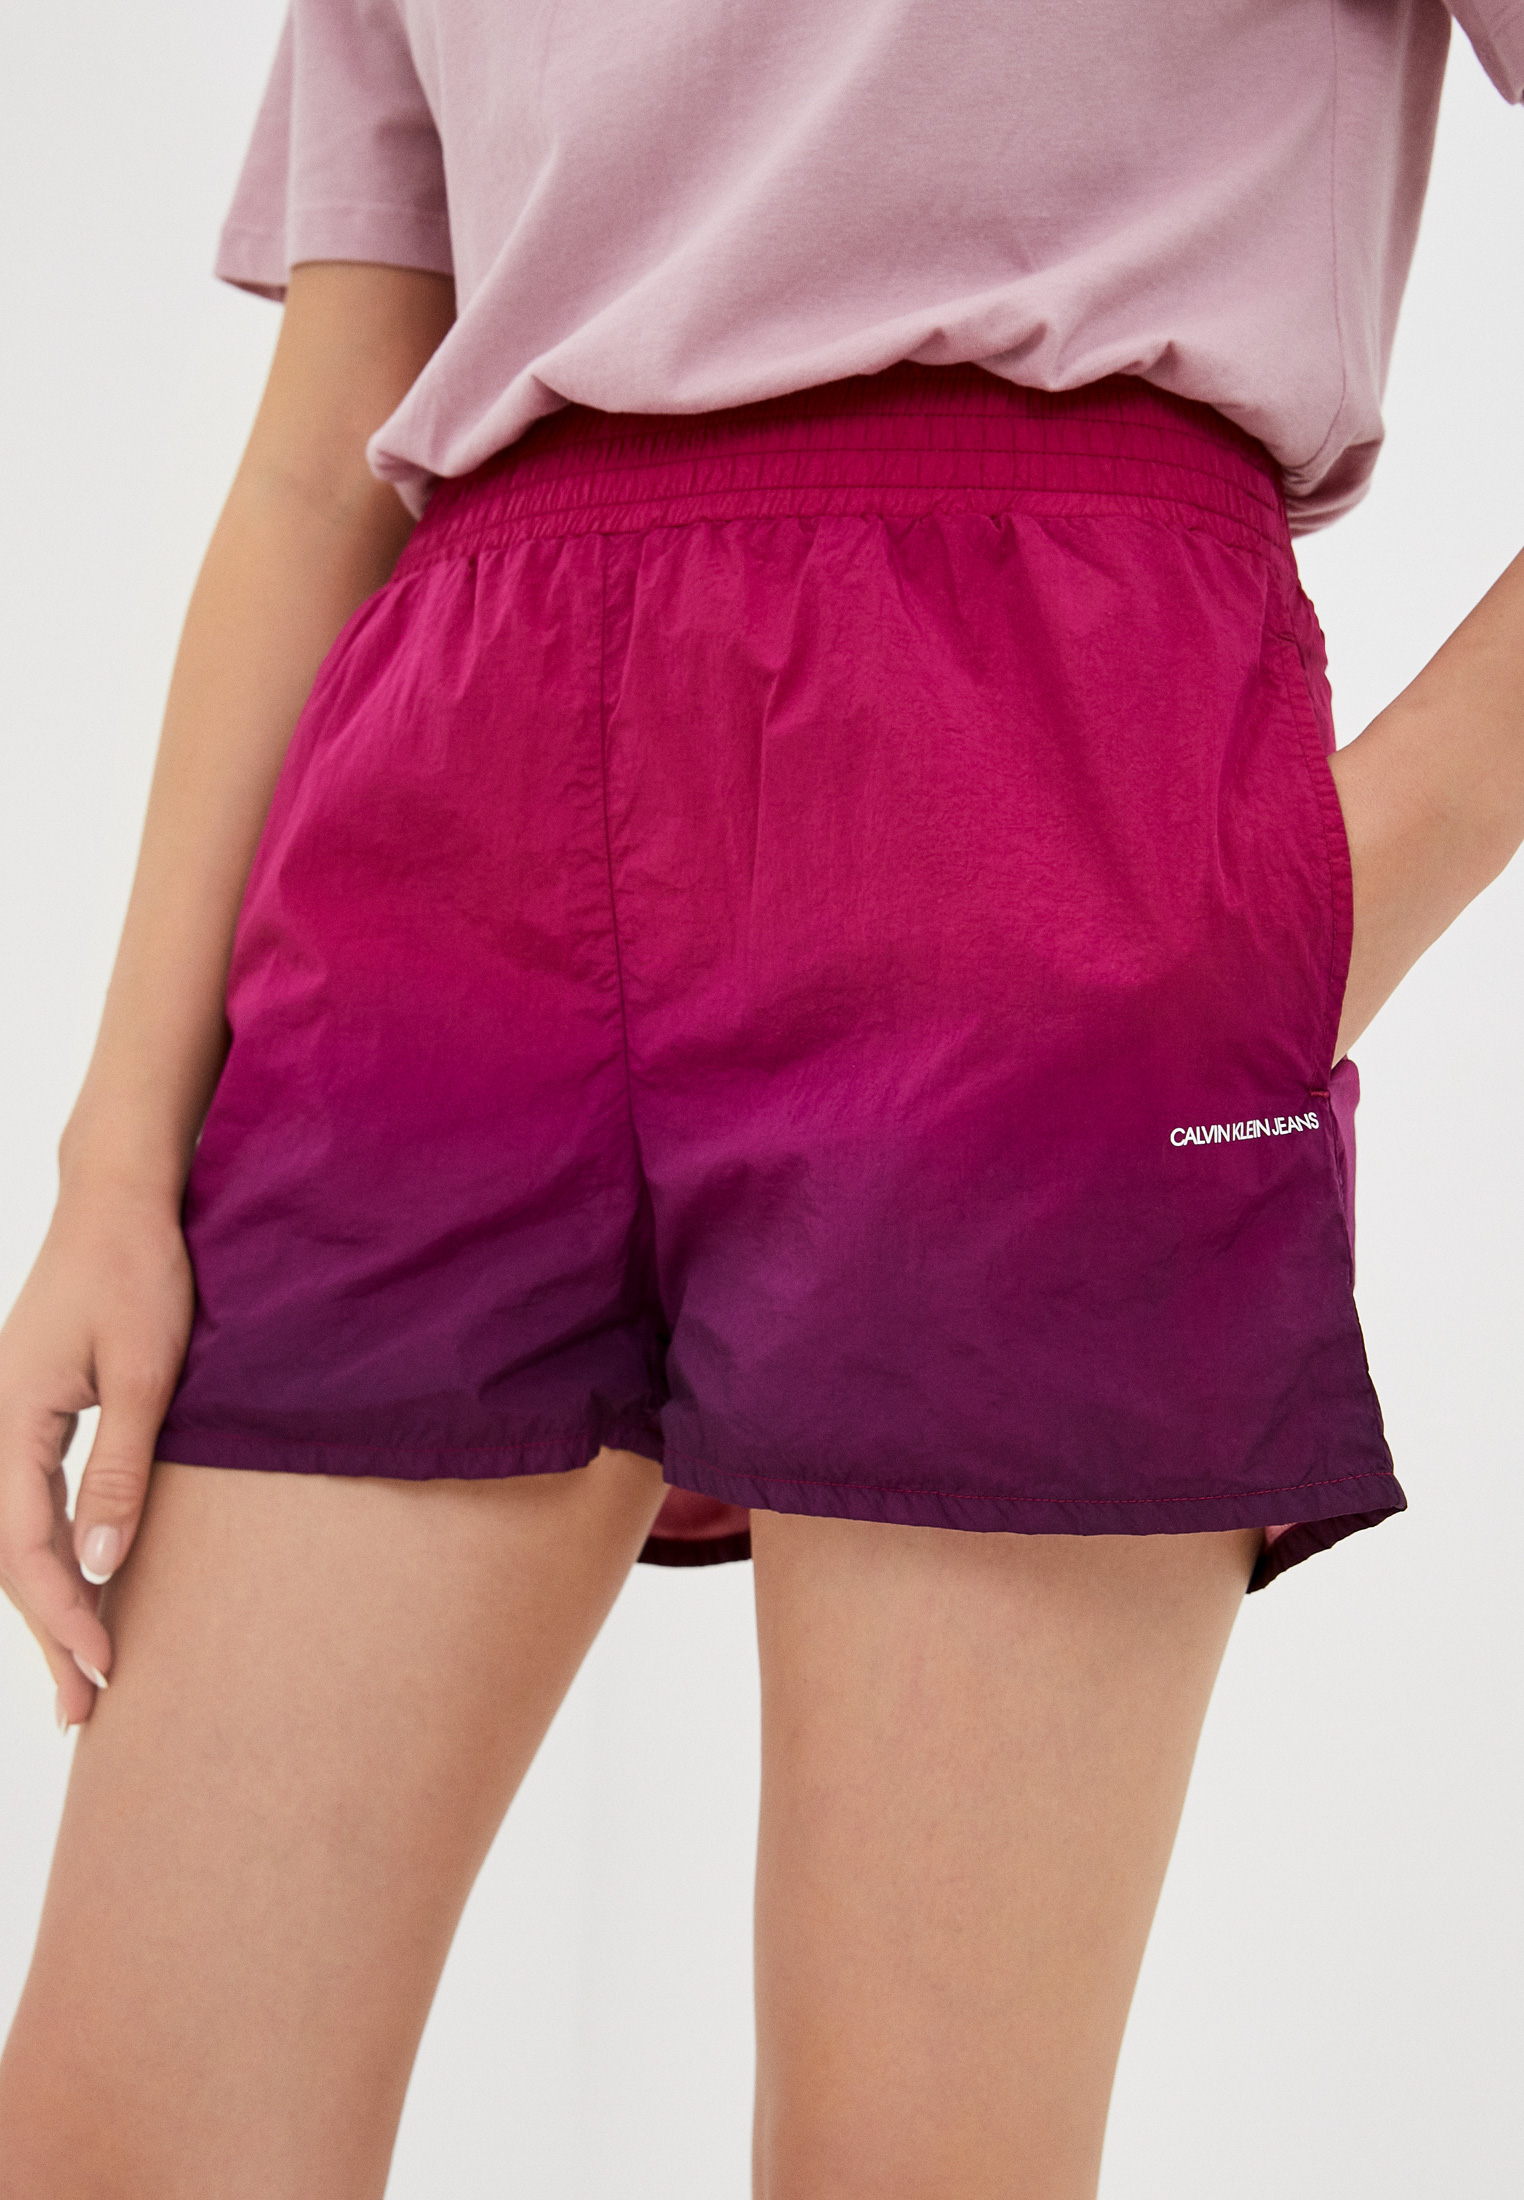 Женские спортивные шорты Calvin Klein Jeans Шорты спортивные Calvin Klein Jeans